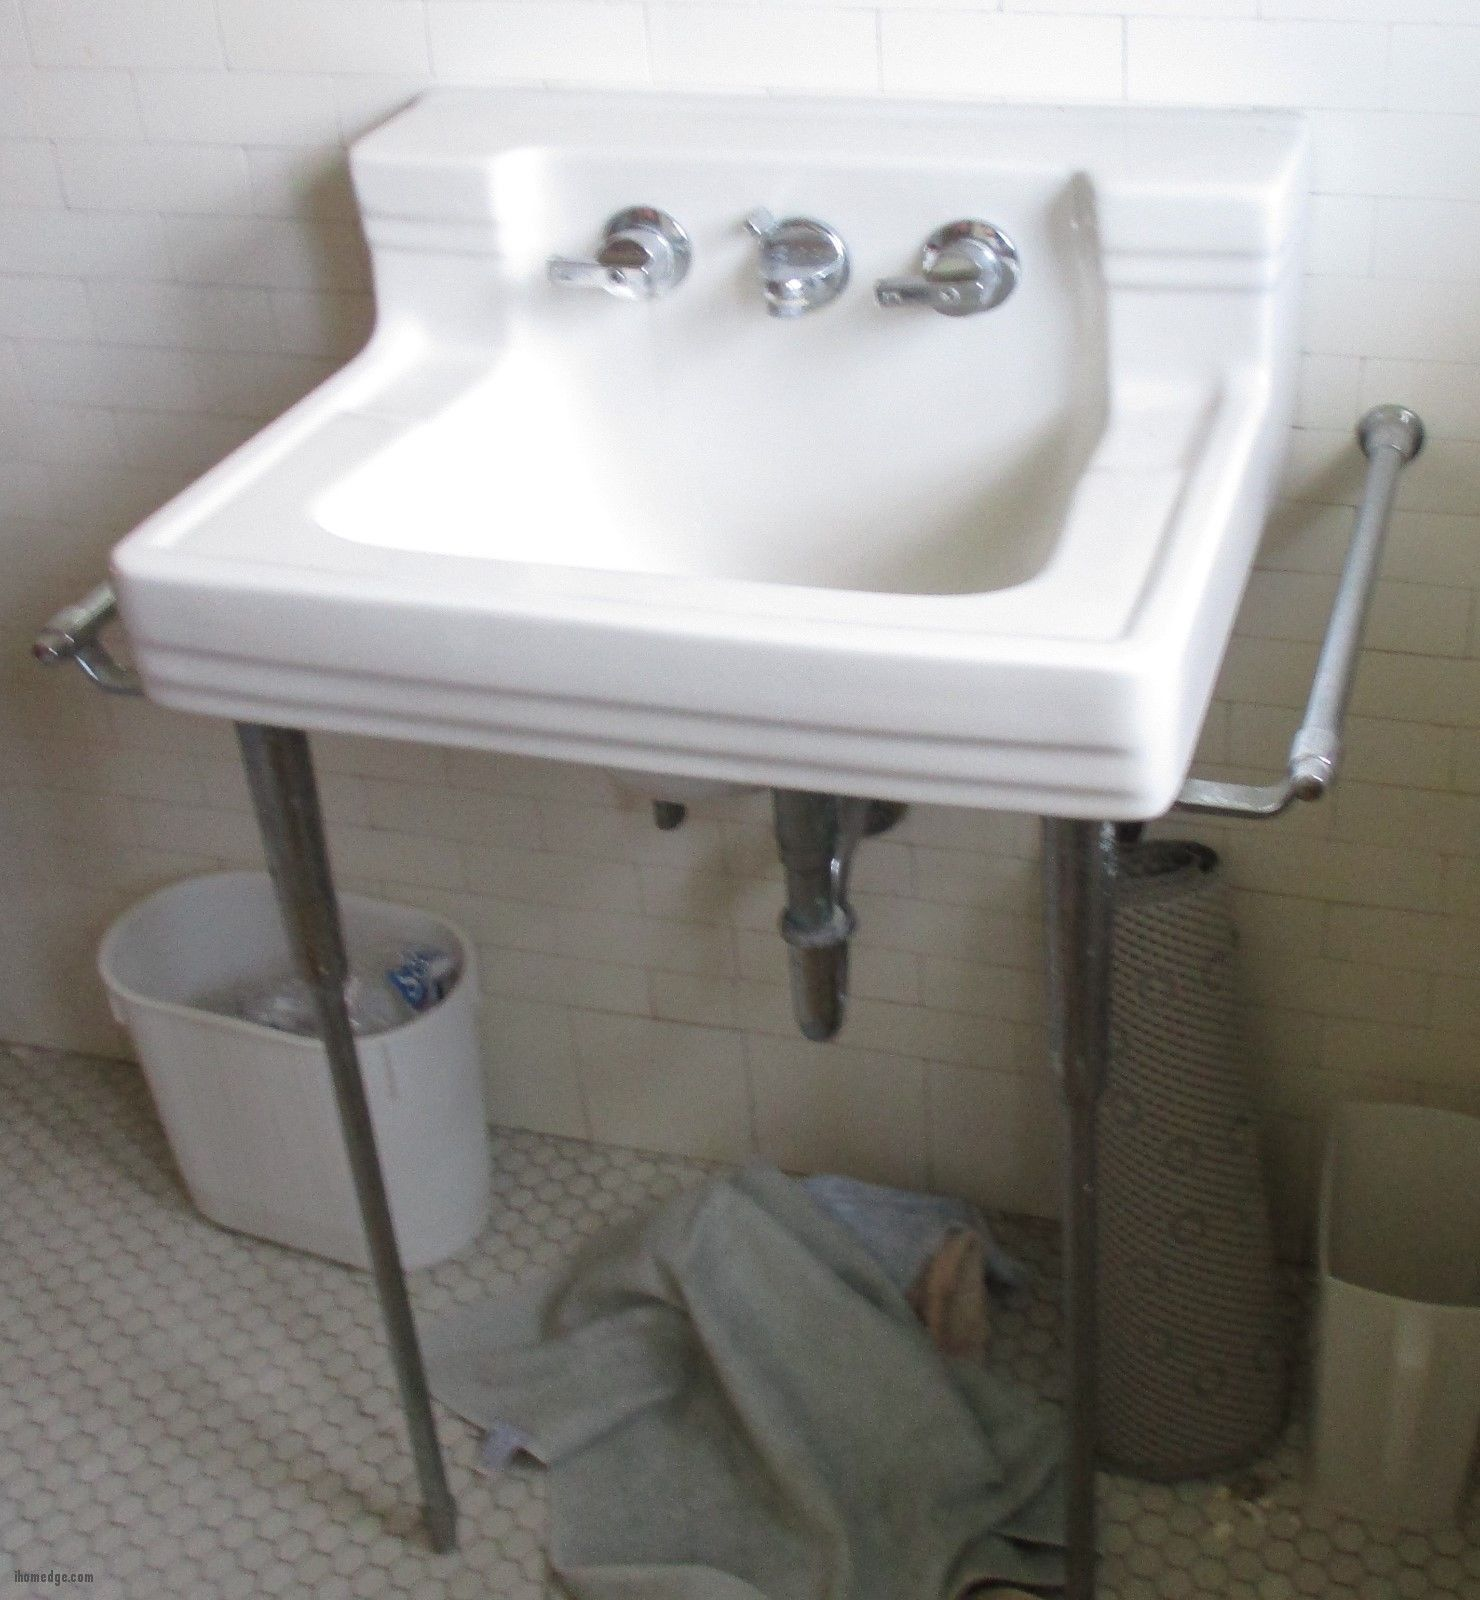 Inspirational Awesome Porcelain Sink Vintage American Standard White W Wall Mount Bracket Legs Bars Http Ihomedge